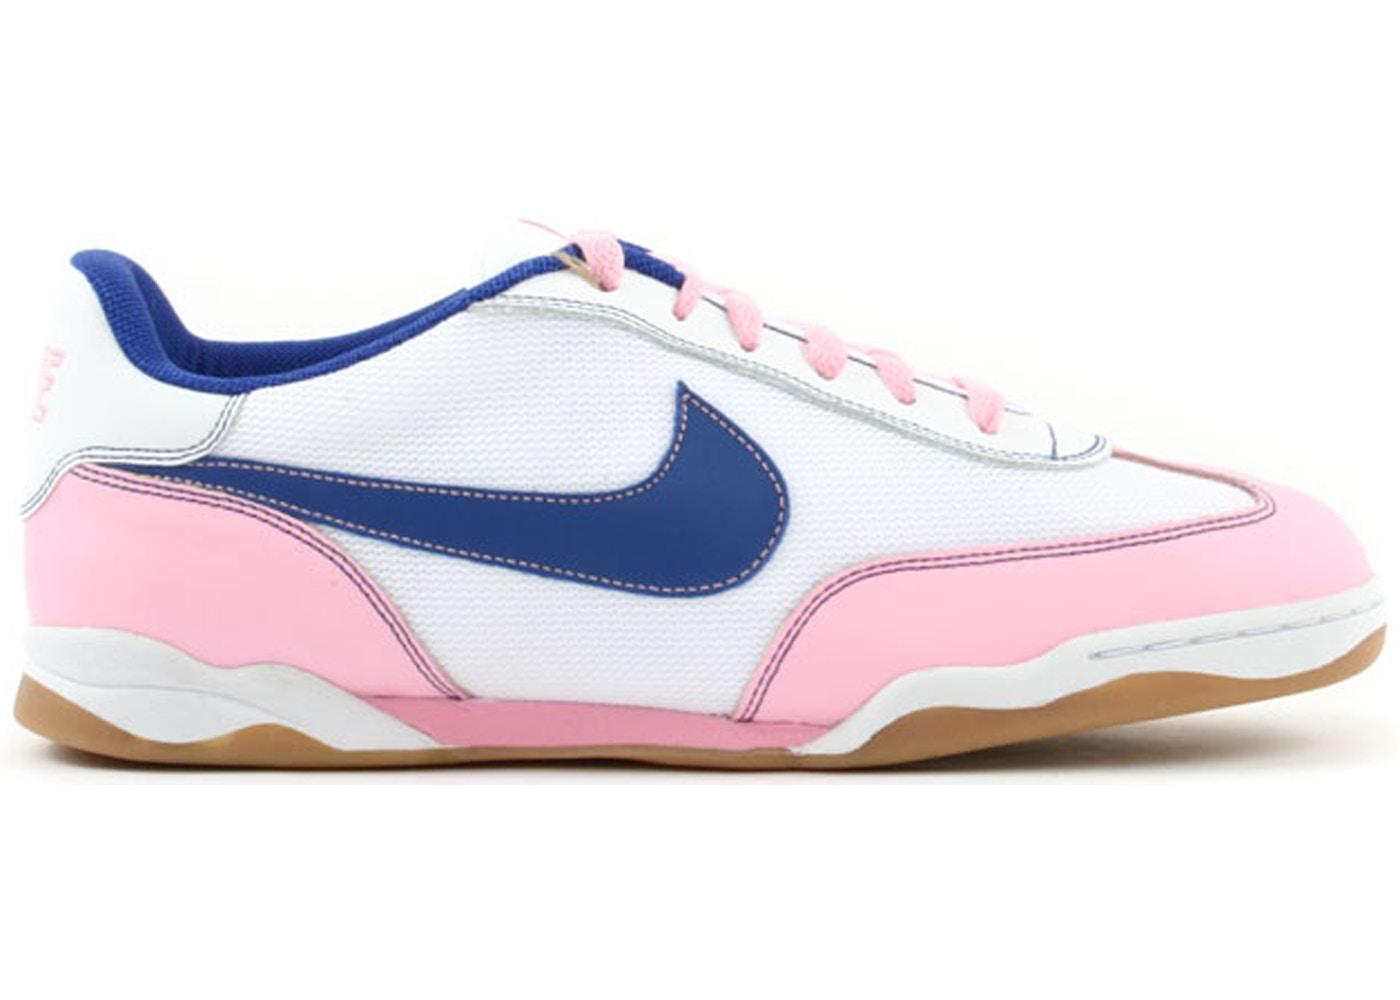 Nike Air Zoom FC Doernbecher (2004) - 308173-141